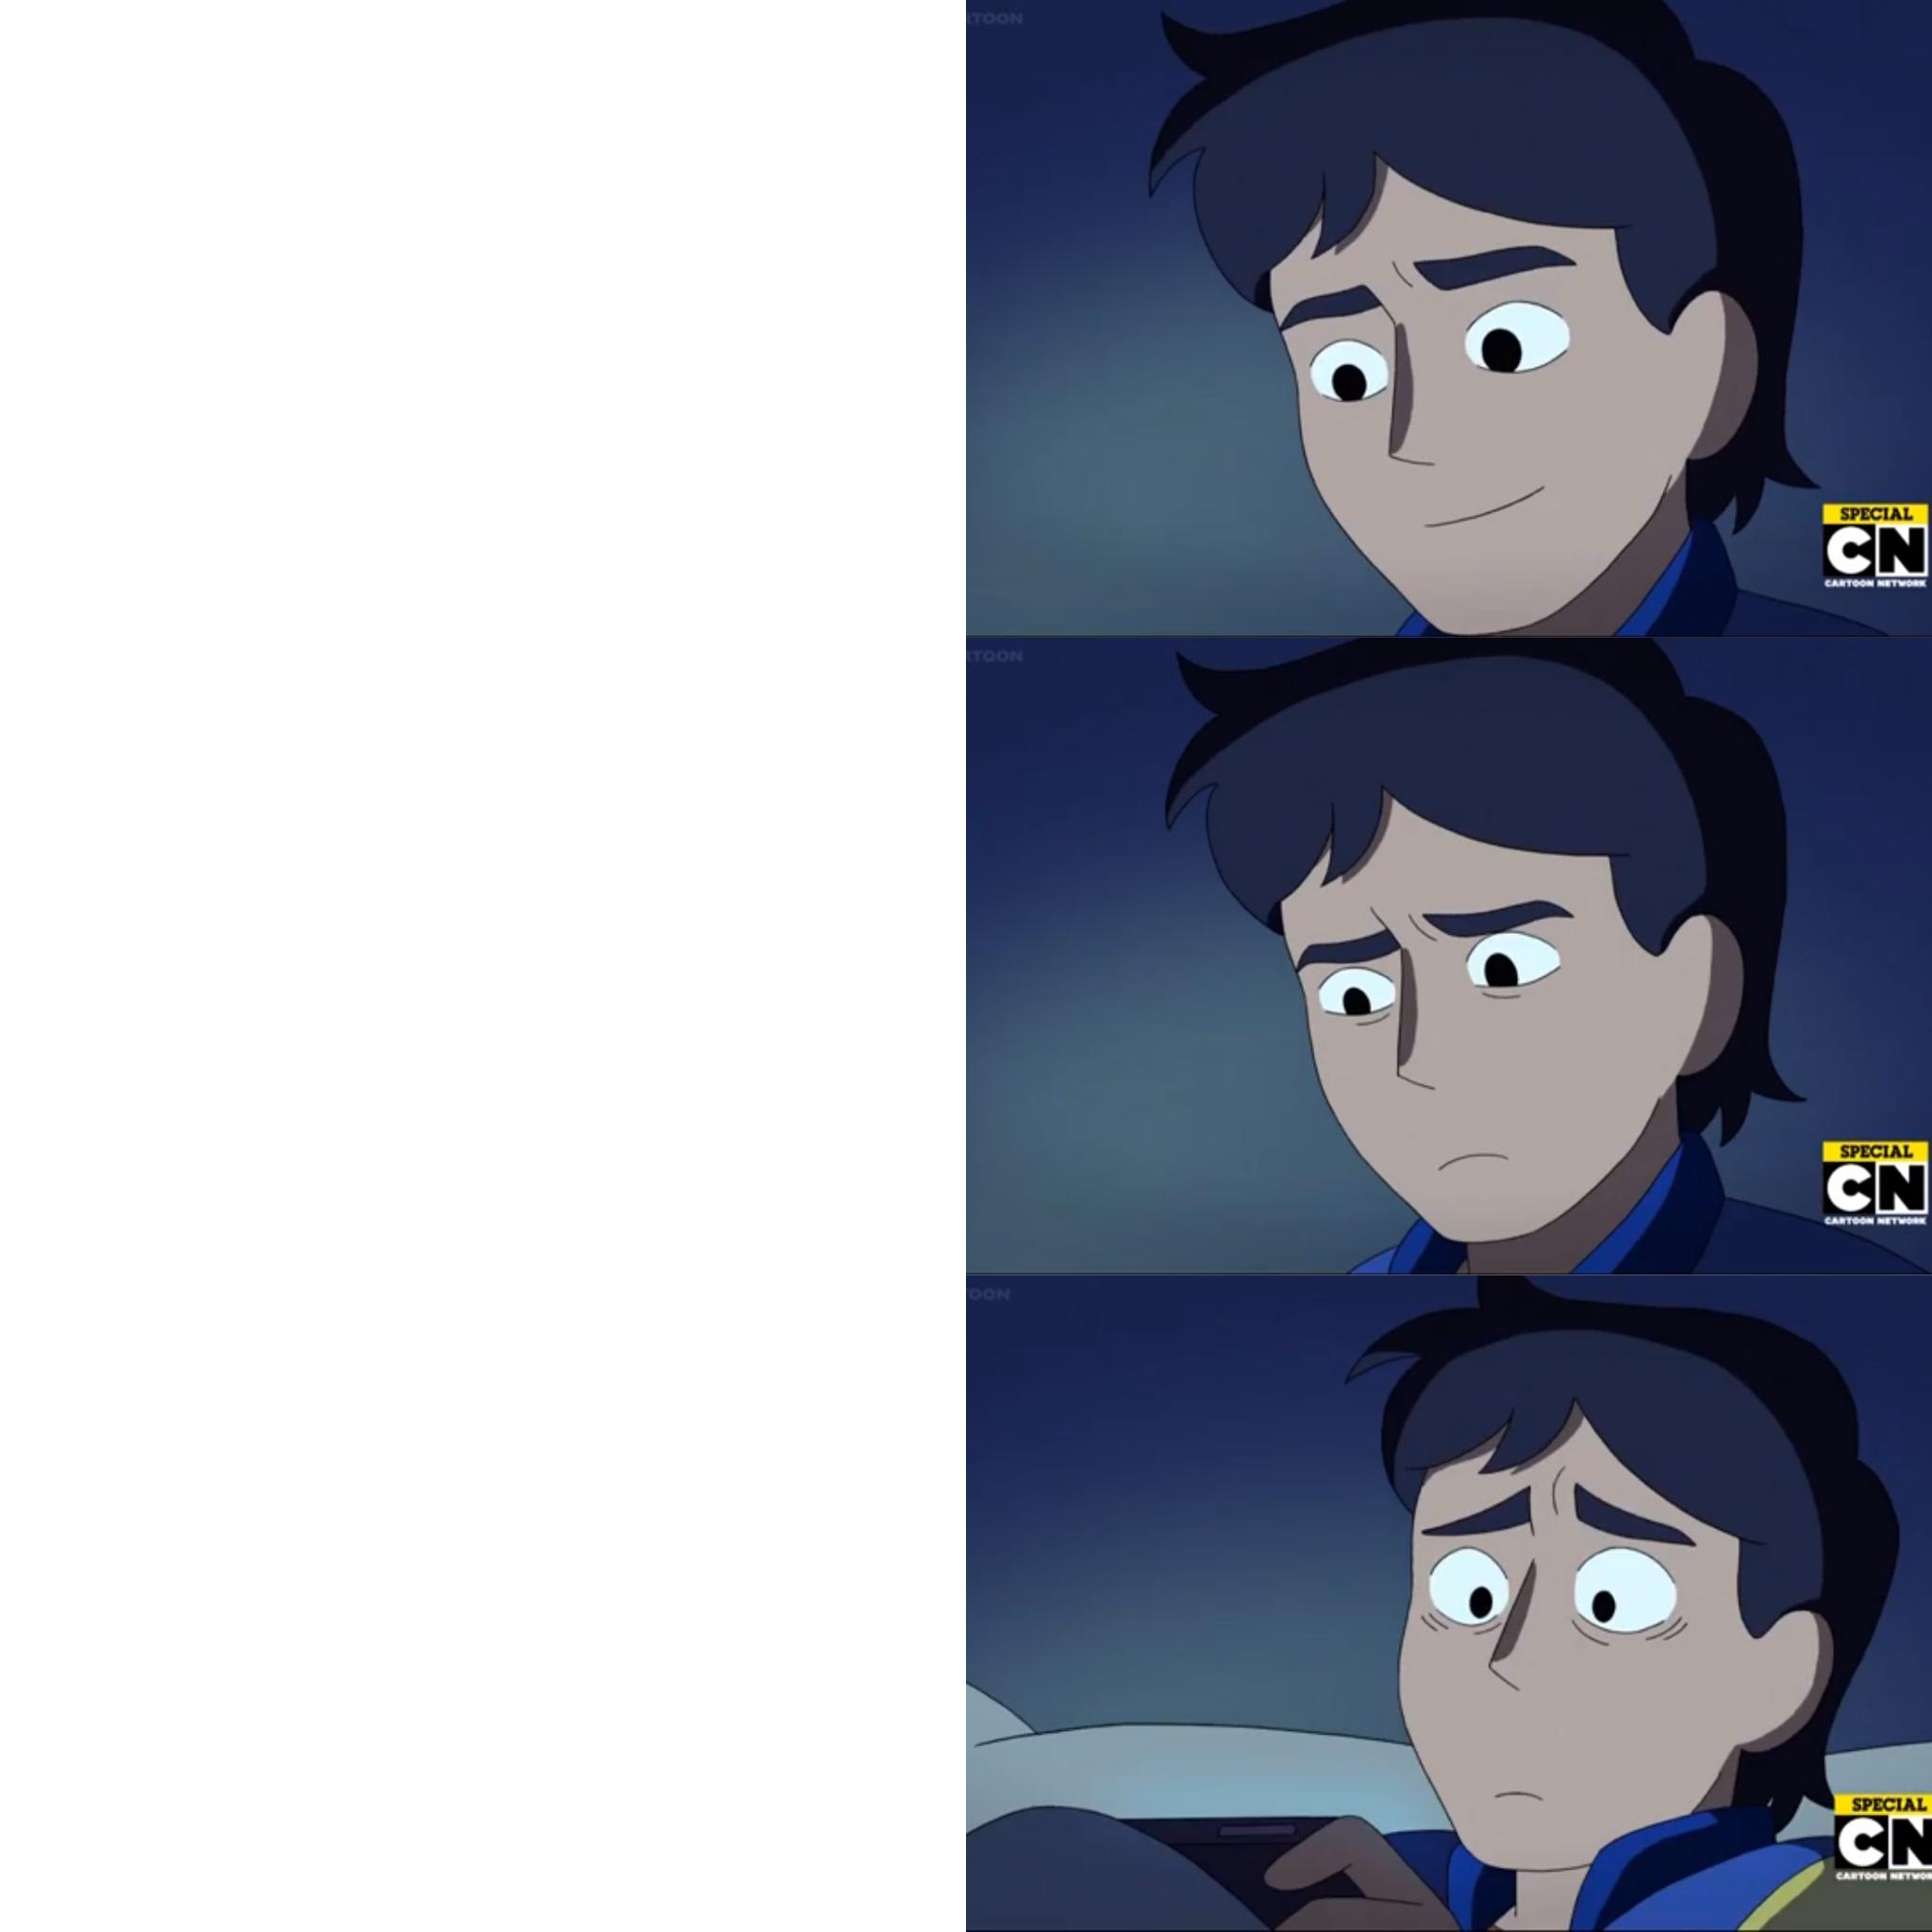 Amber Can We Make This A New Meme Template Cartoon Template Train Art Meme Template